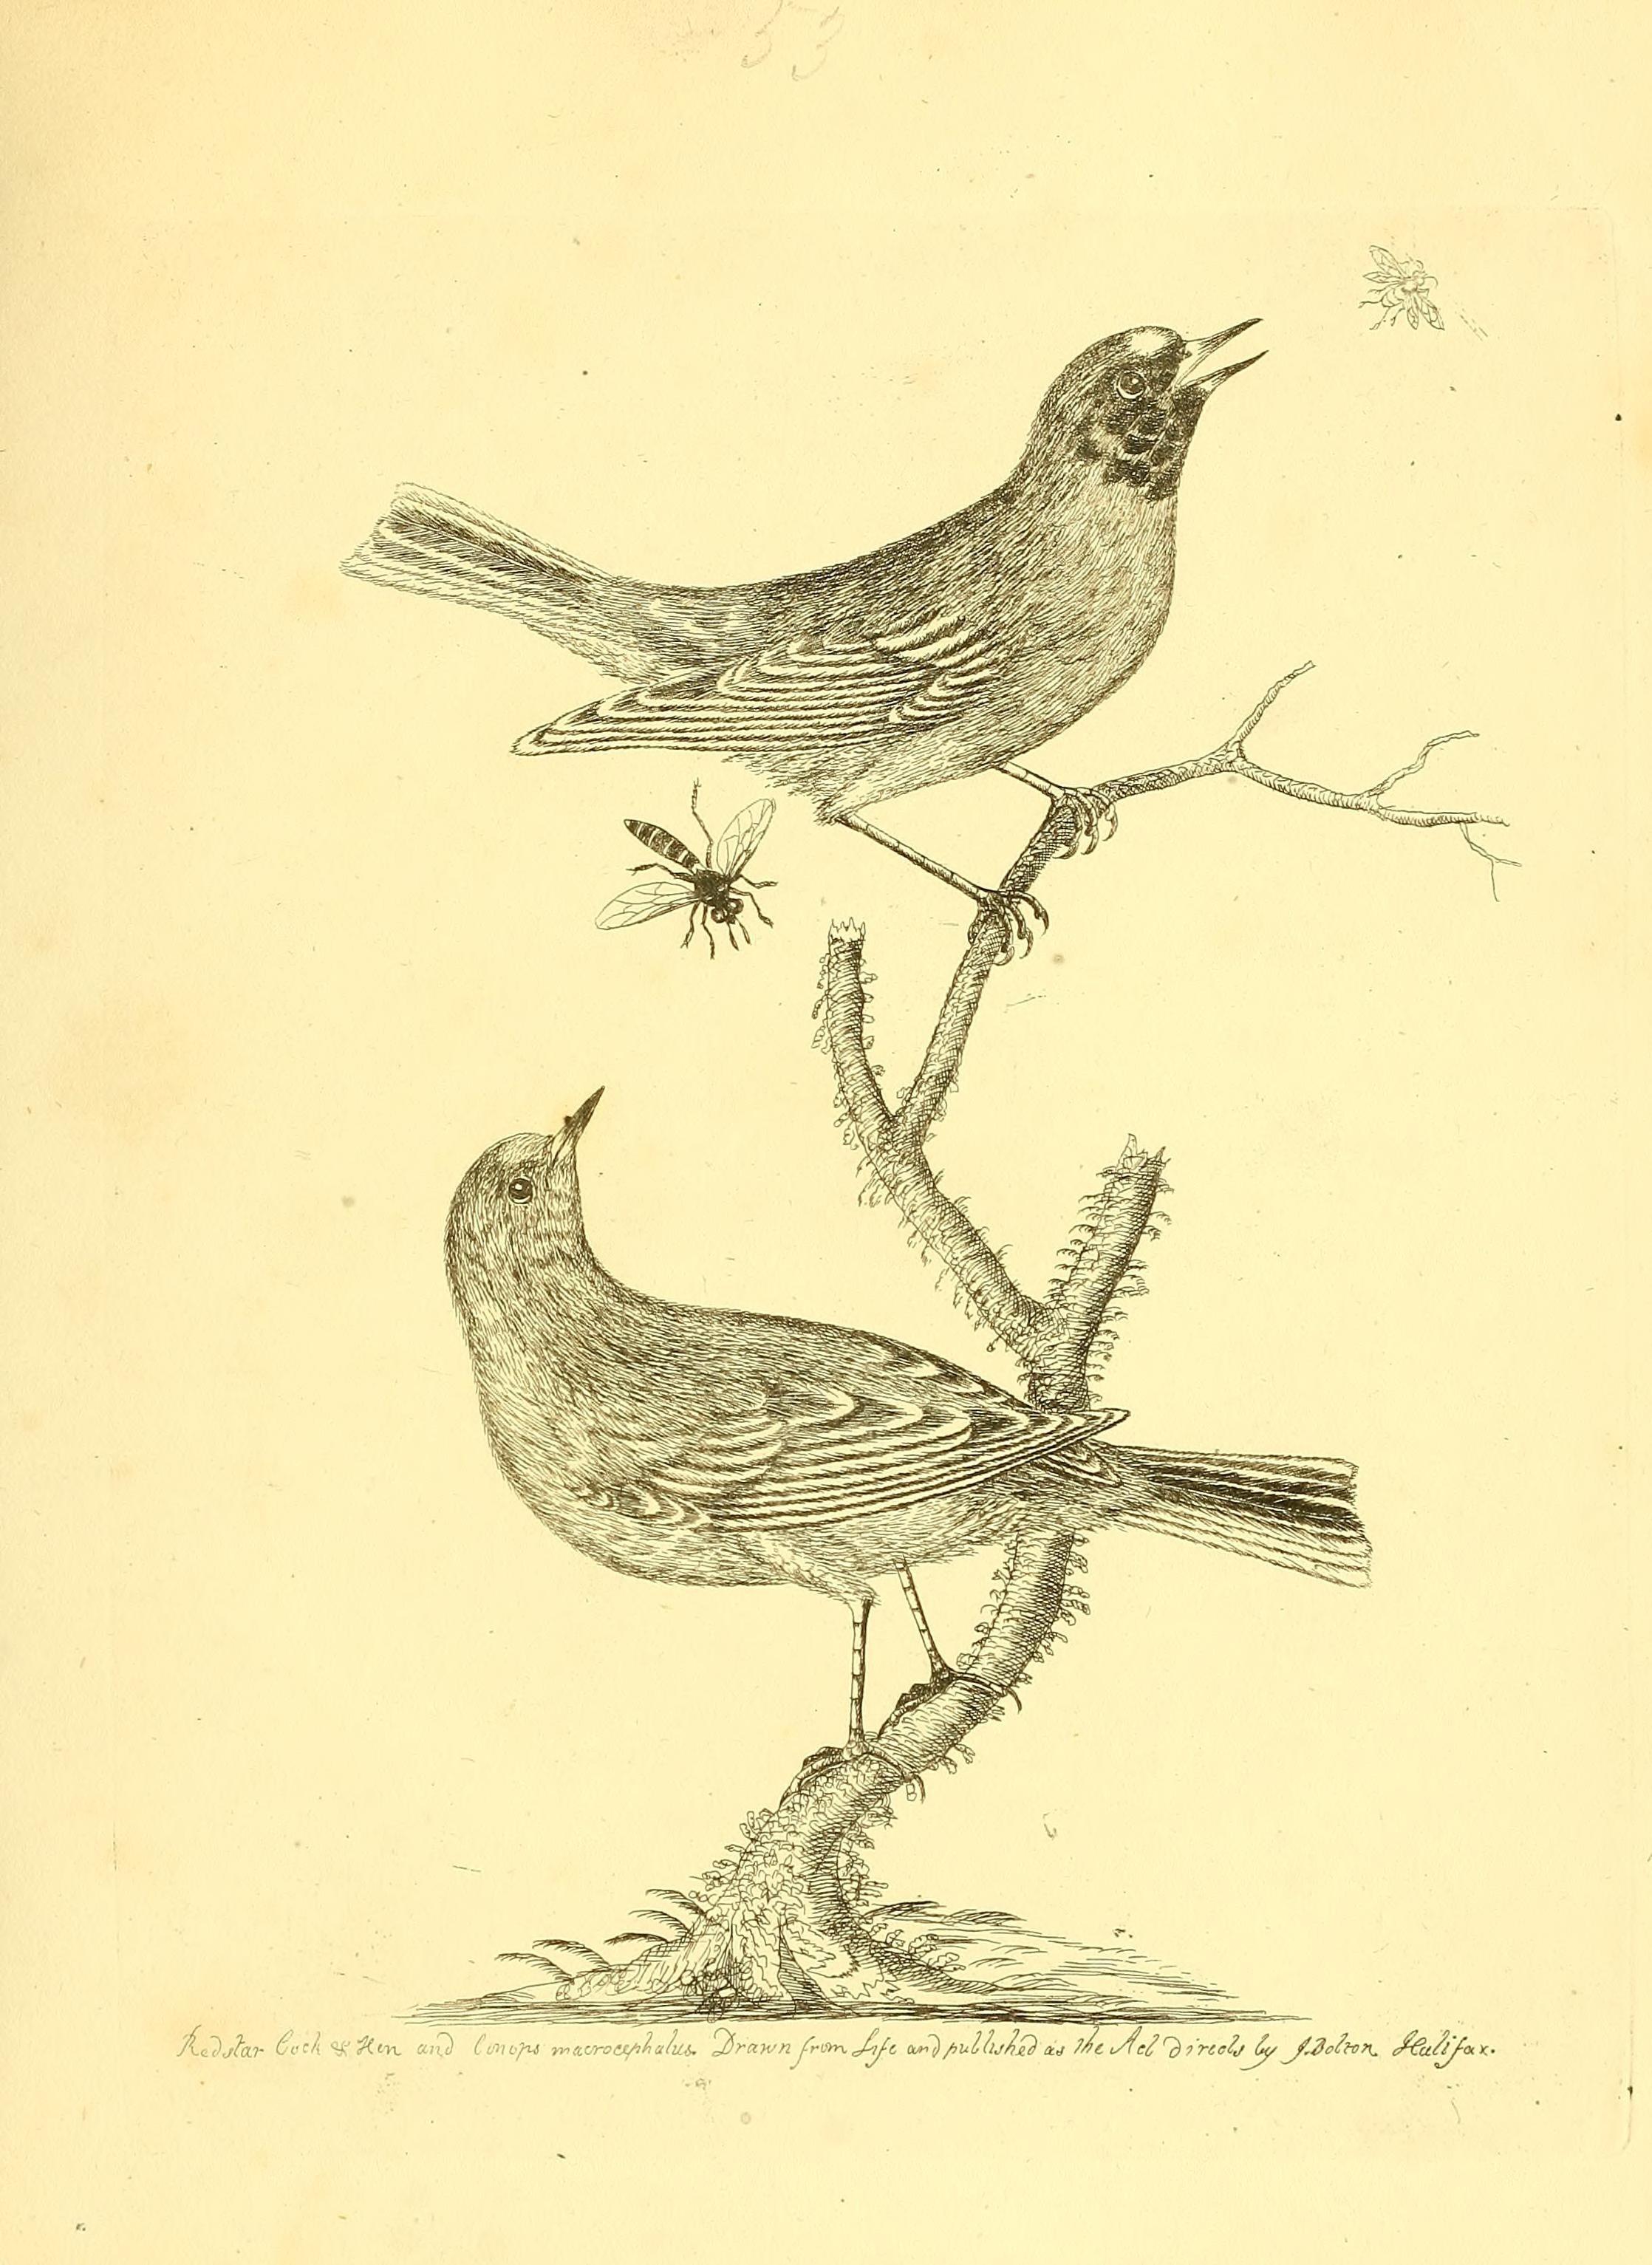 File:Harmonia ruralis, or, An essay towards a natural history of